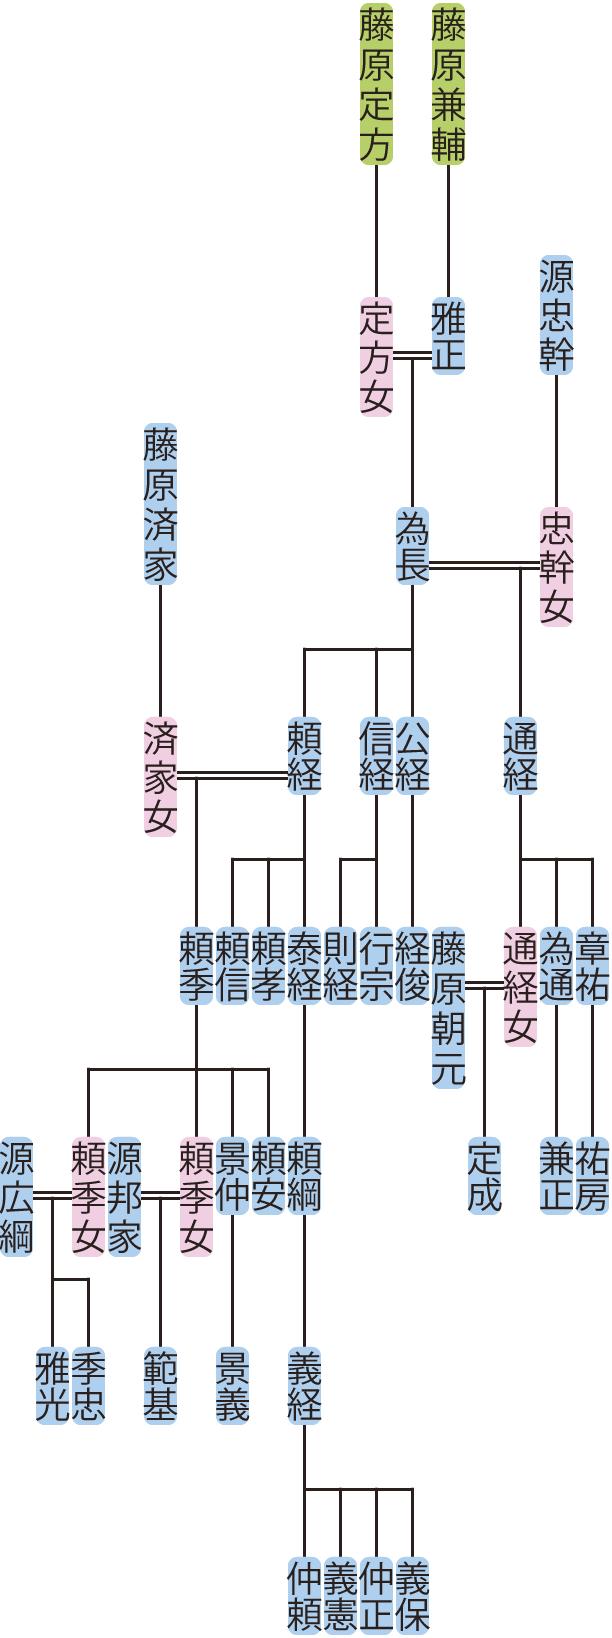 藤原為長~頼綱の系図